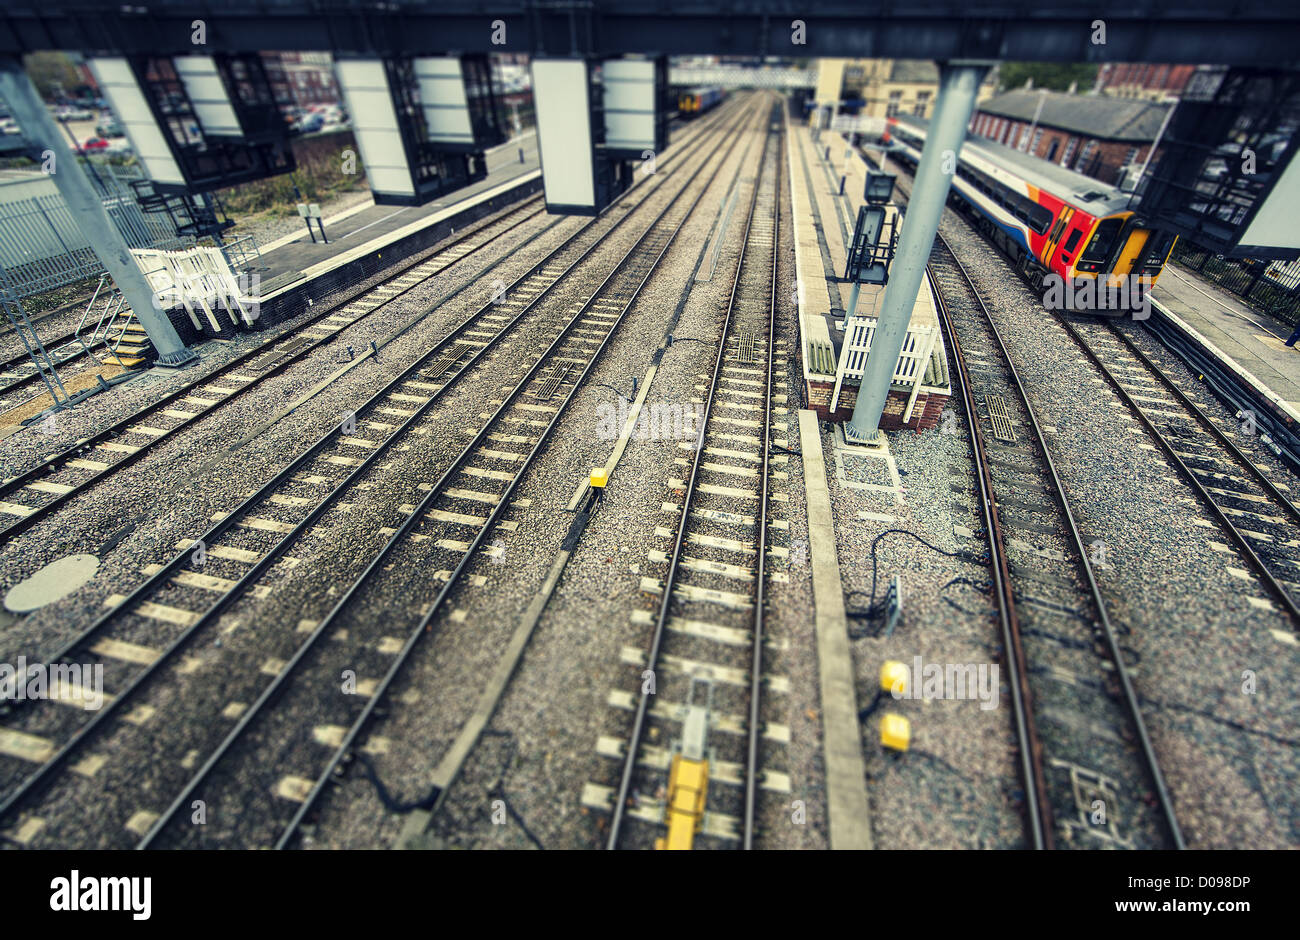 lincoln railway station platforms - Stock Image